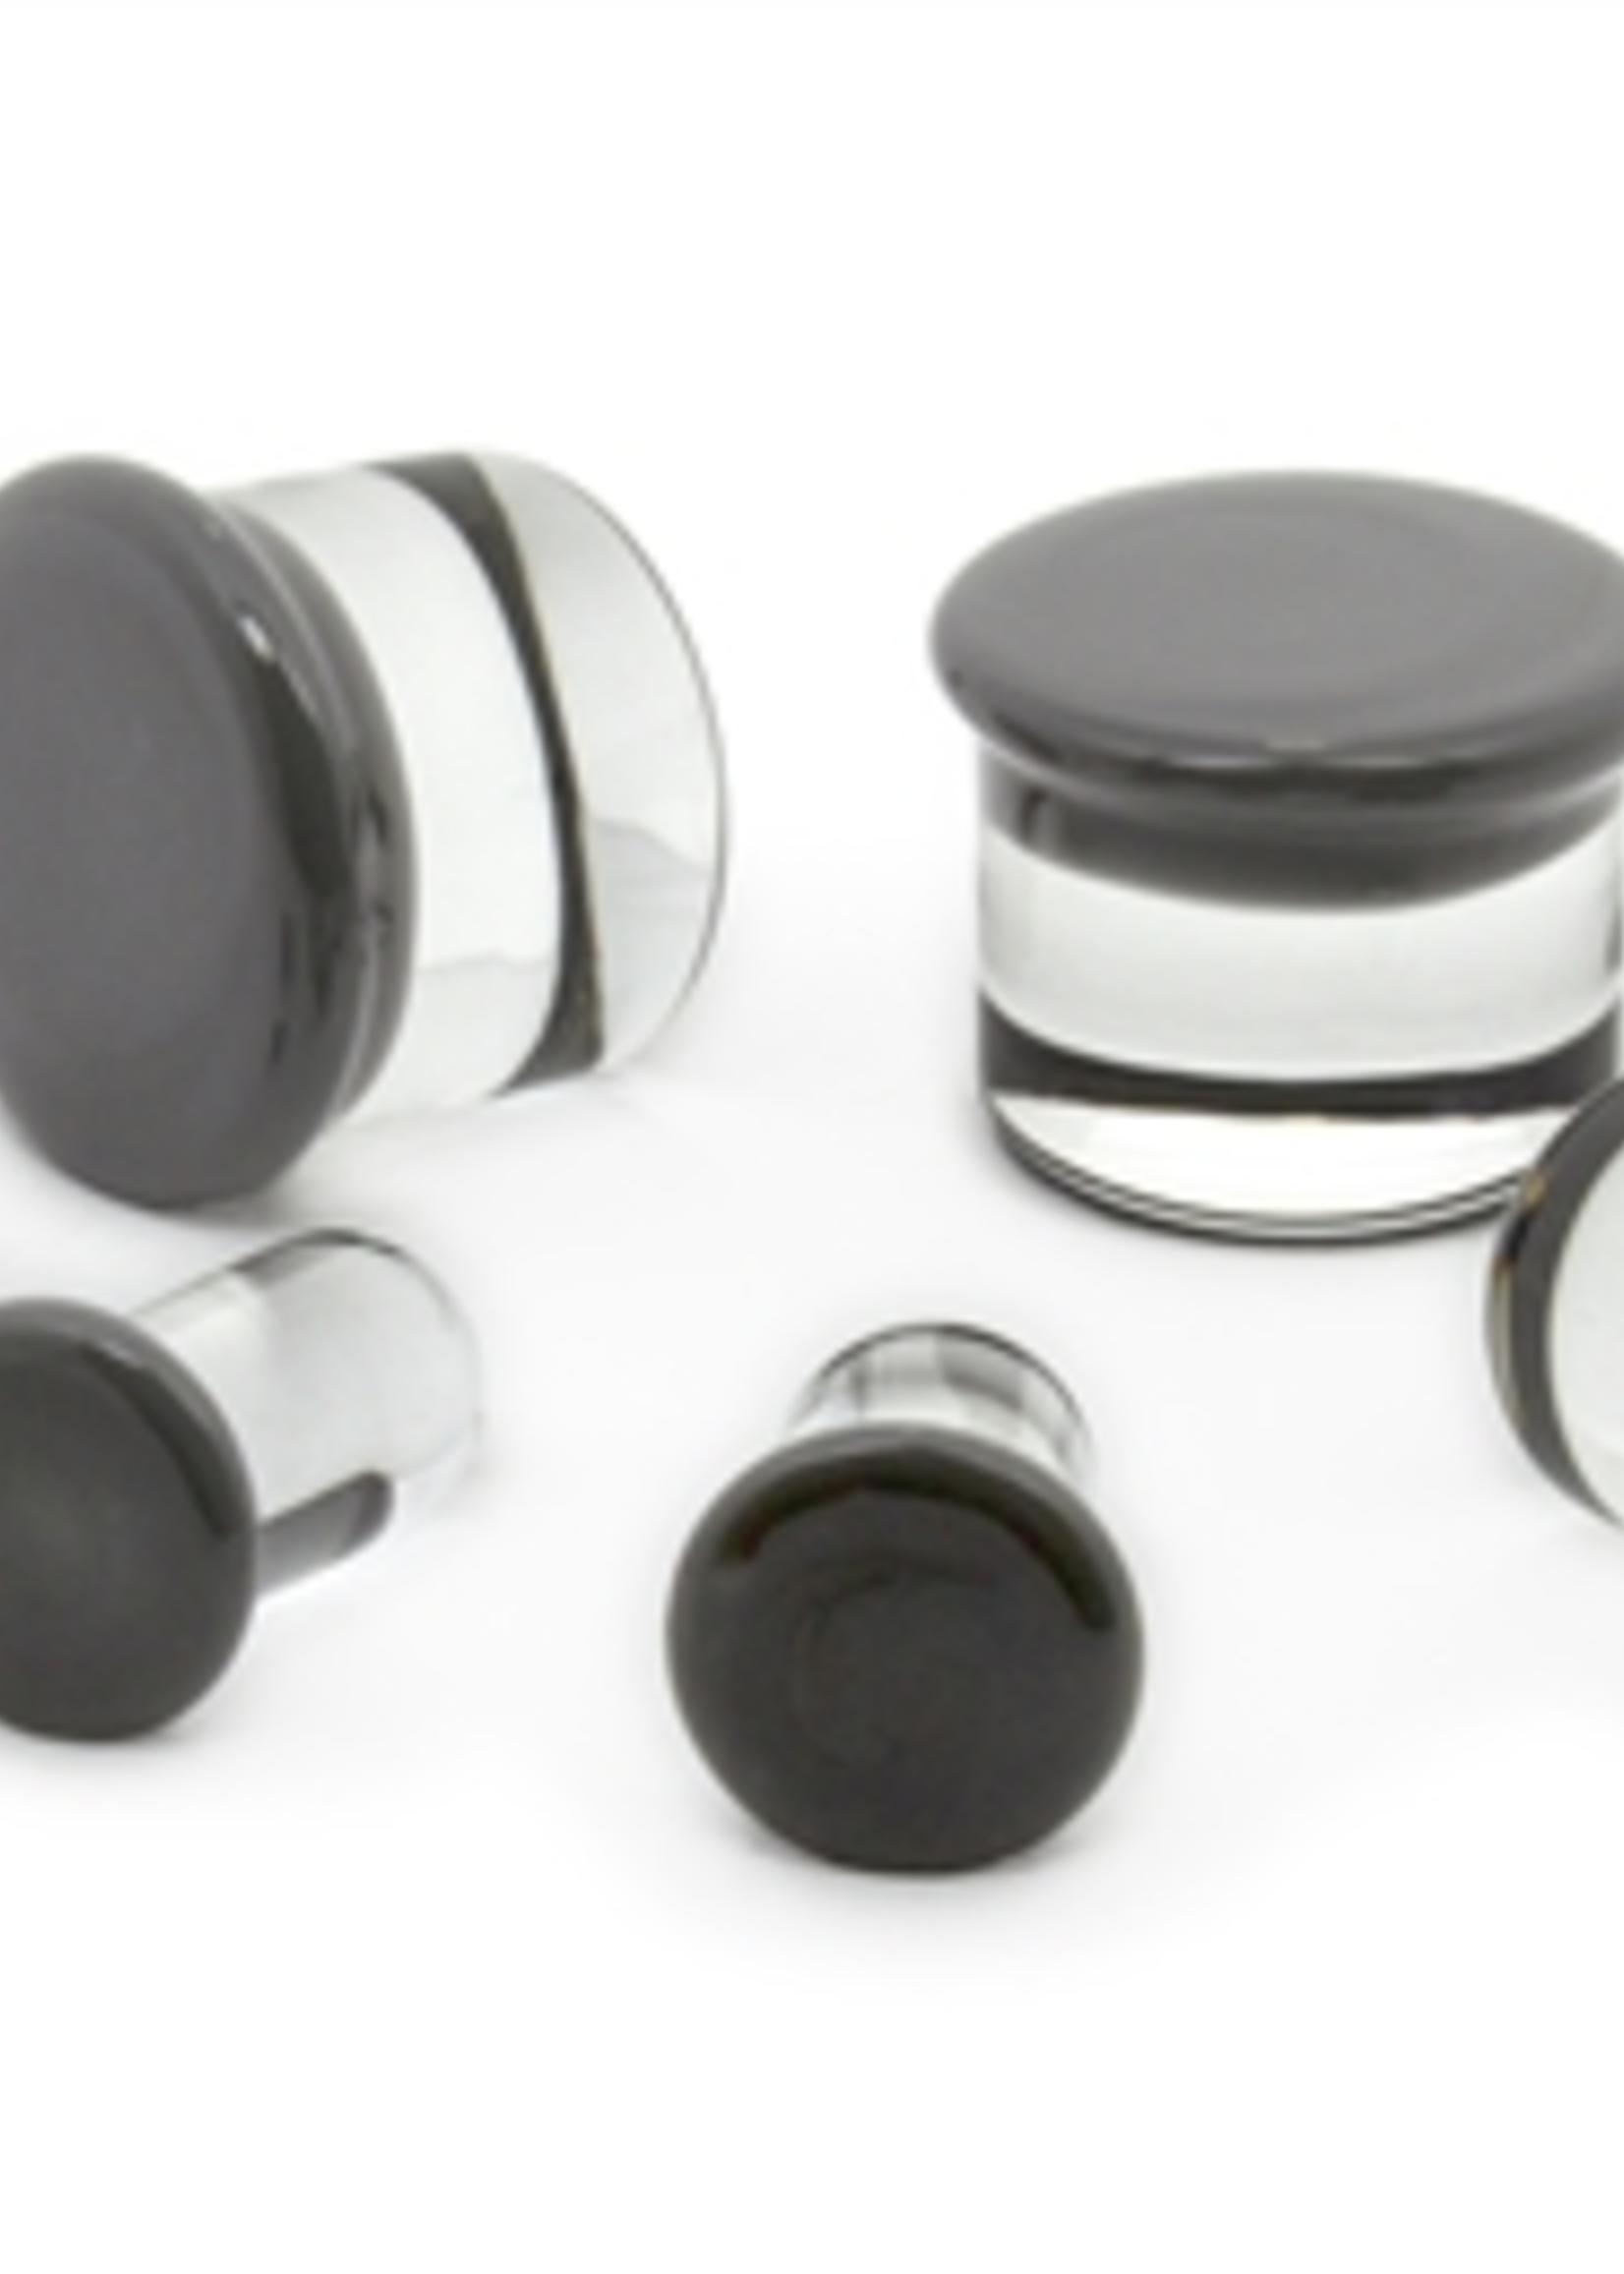 25mm SF Glass Plugs